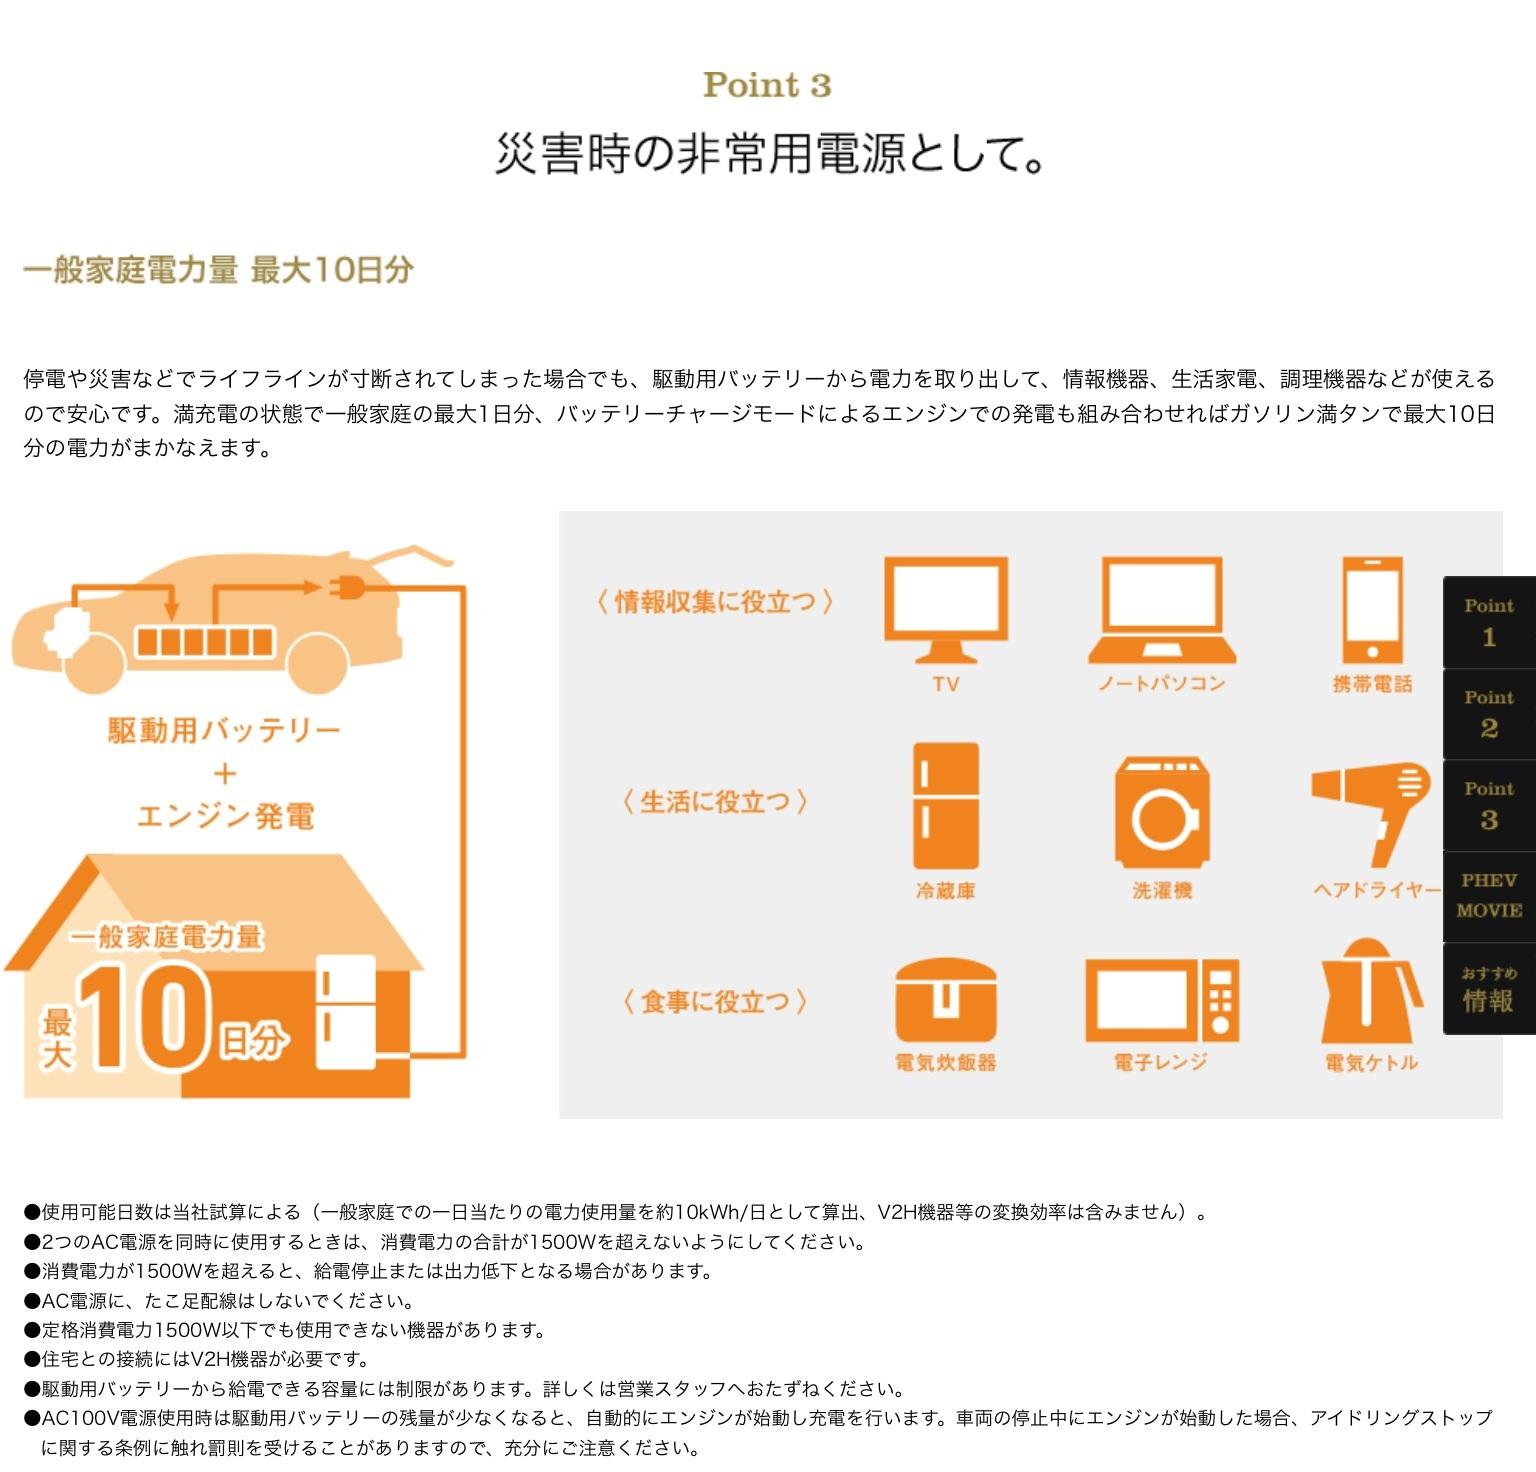 https://www.hyogo-mitsubishi.com/shop/akashi/files/cccb5f6d89cf8df8717bc5977e76c1b23f693e25.jpg